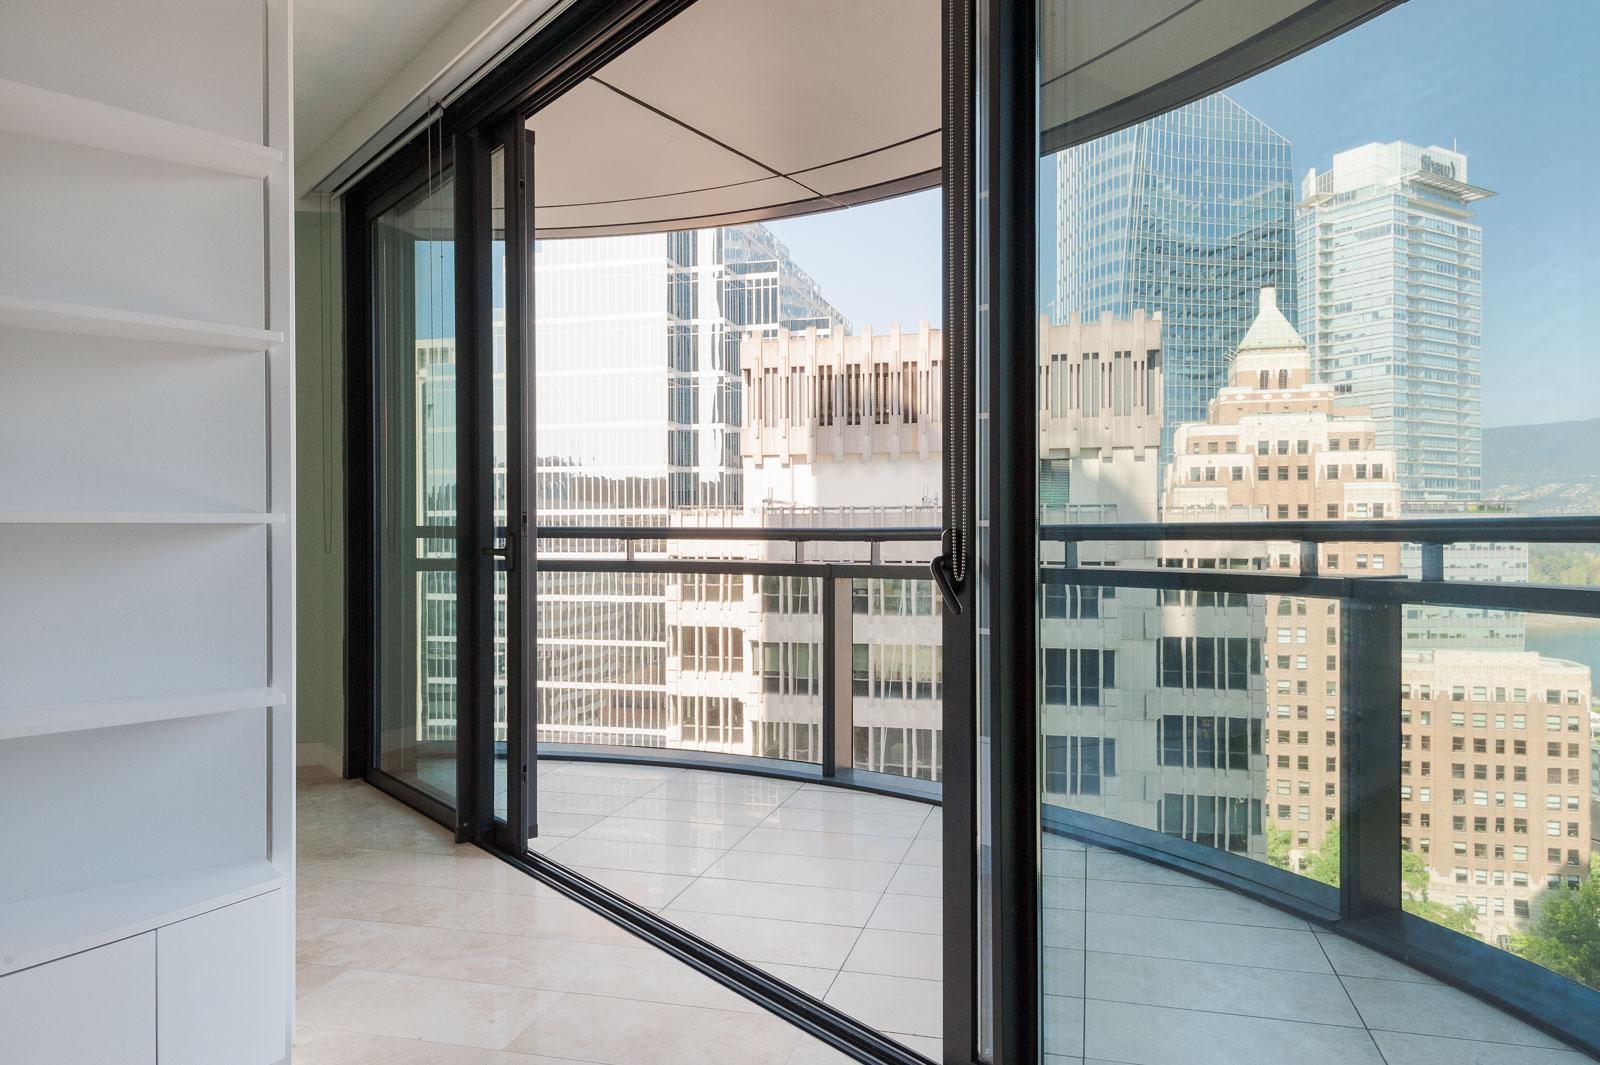 Entrance onto private balcony of Vancouver condo rental.